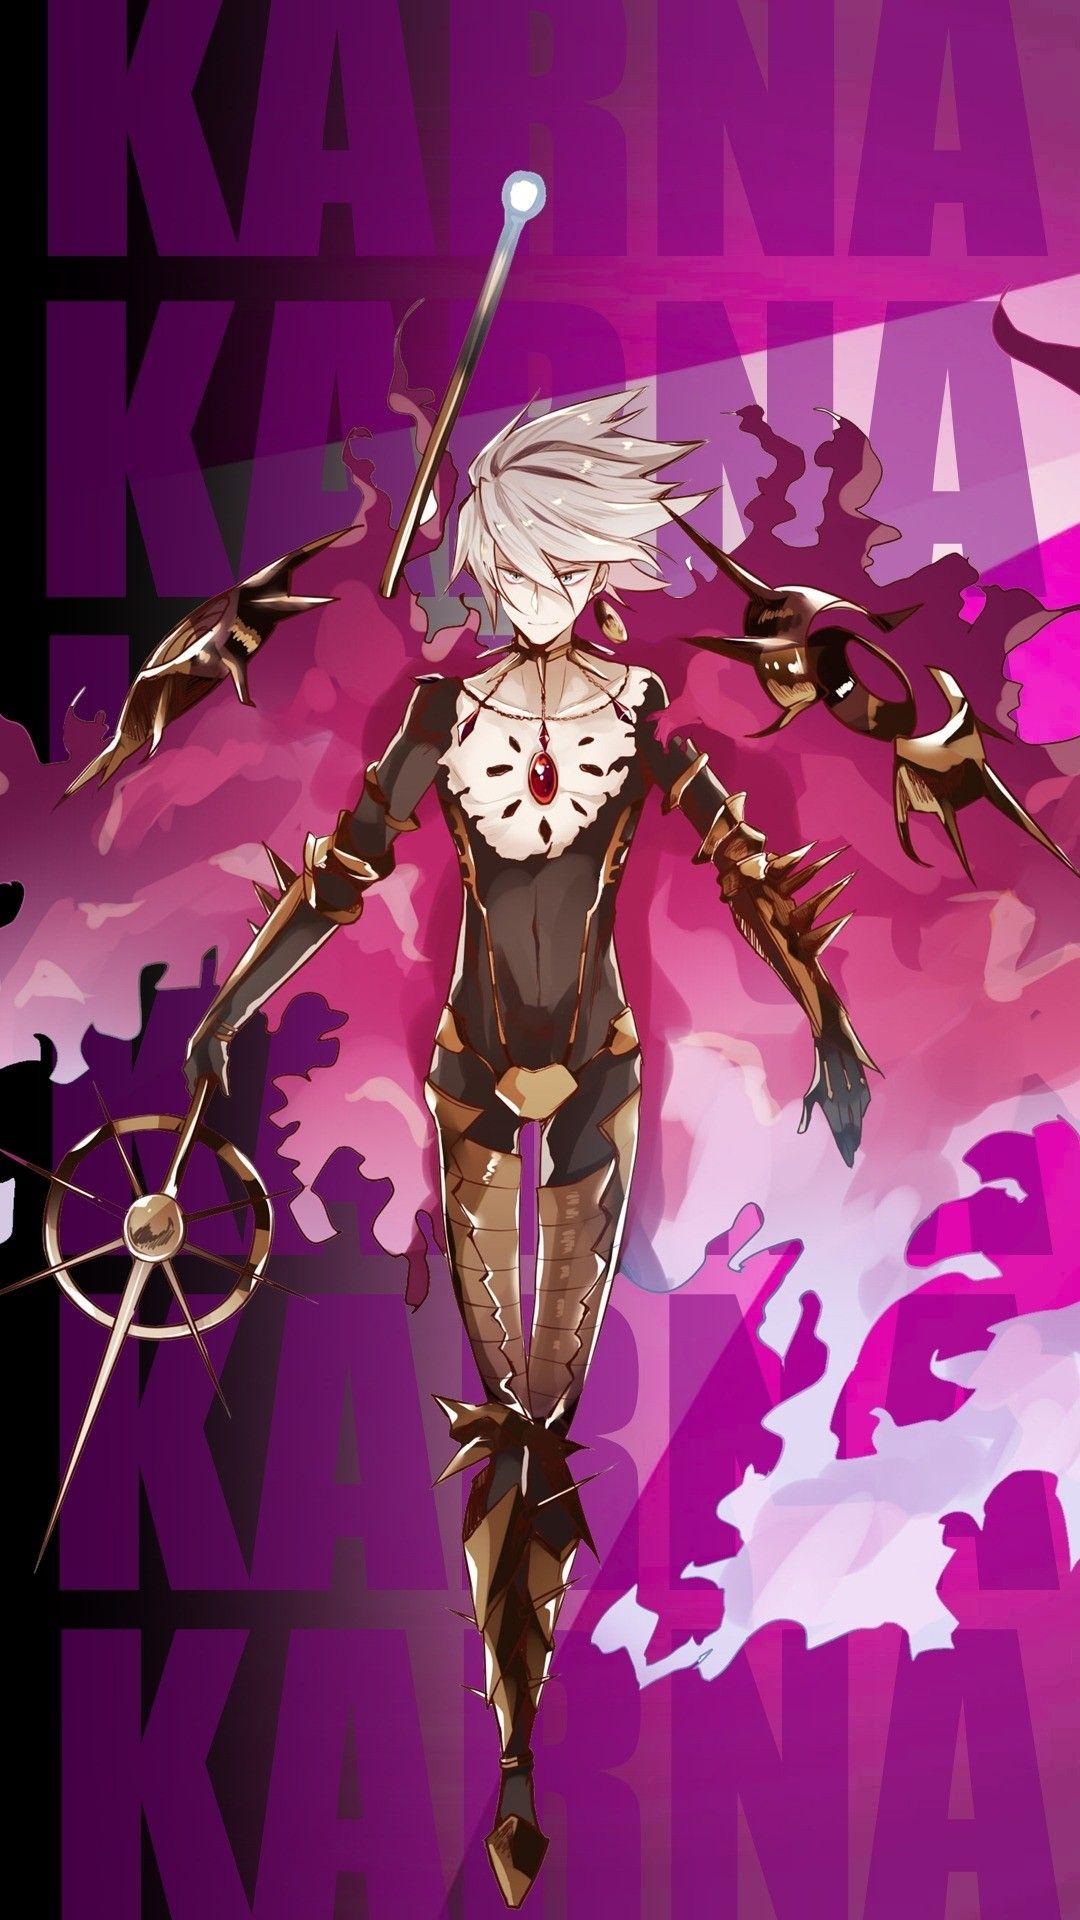 Fate Apocrypha Karna Lancer Of Red Wallpaper Anime